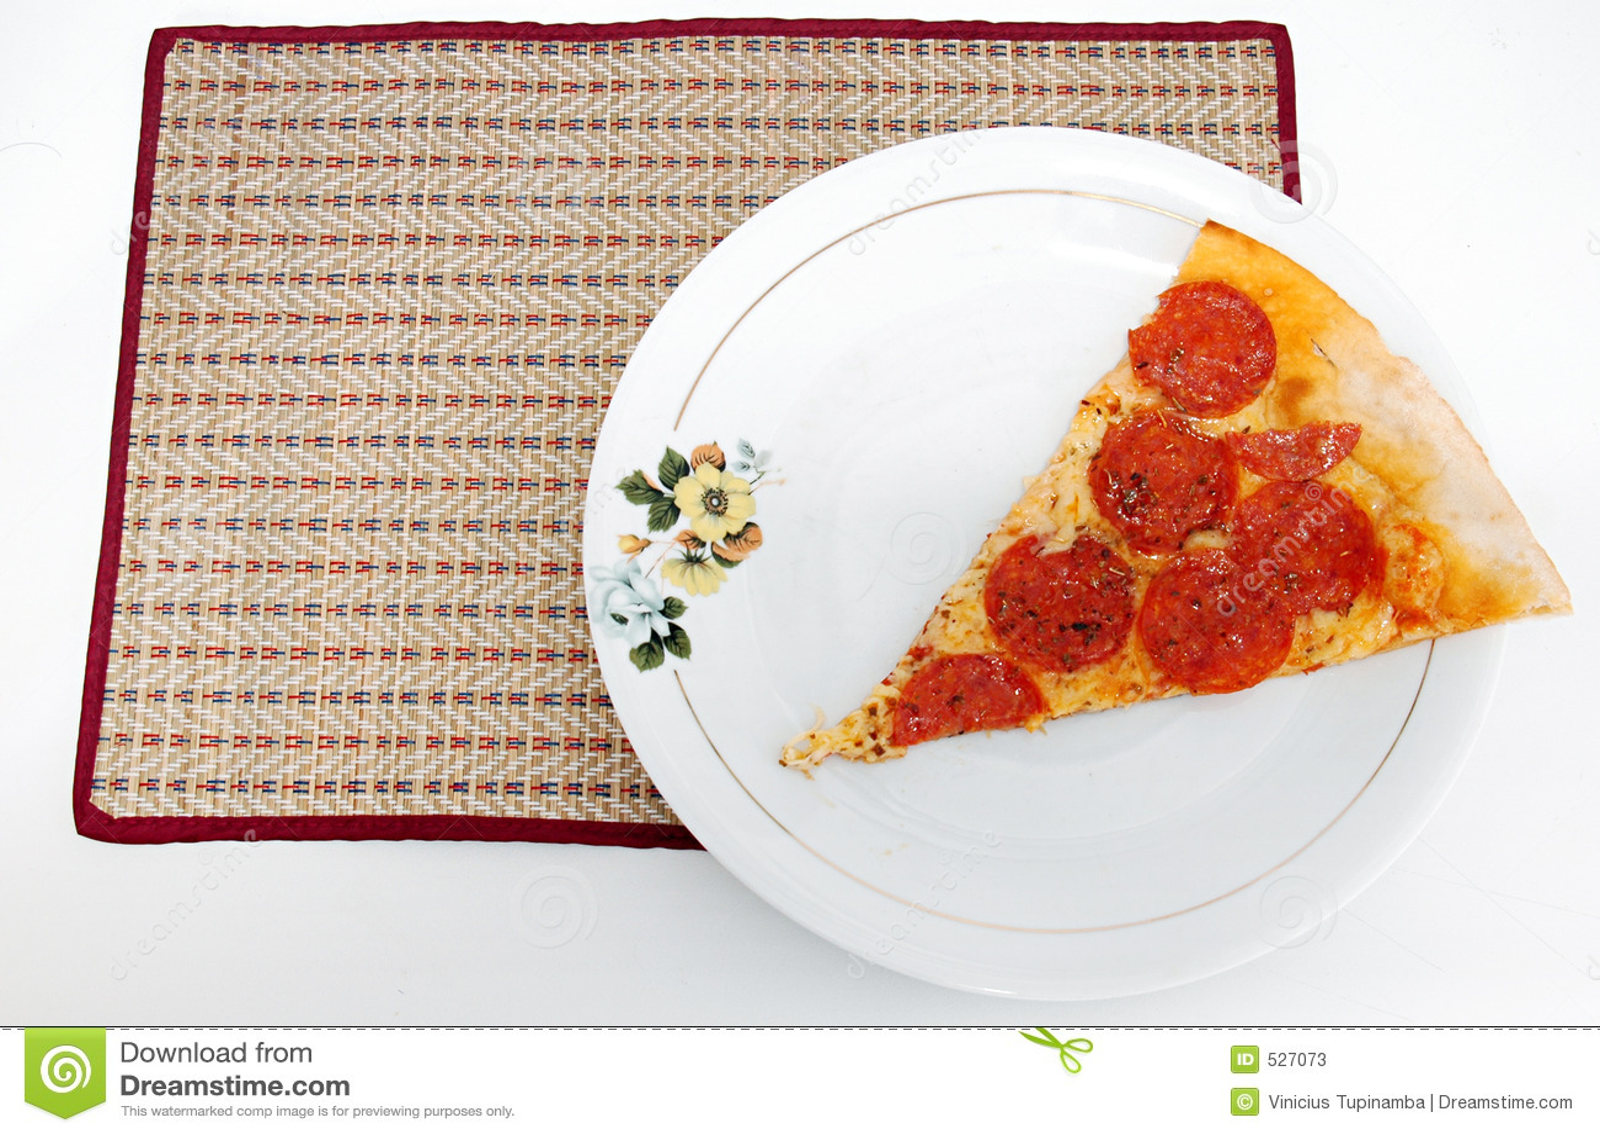 Download 薄饼时间 库存图片. 图片 包括有 膳食, 薄饼, 干酪, 旧货, 意大利语, 快速, 可口, 卡路里, 香料 - 527073